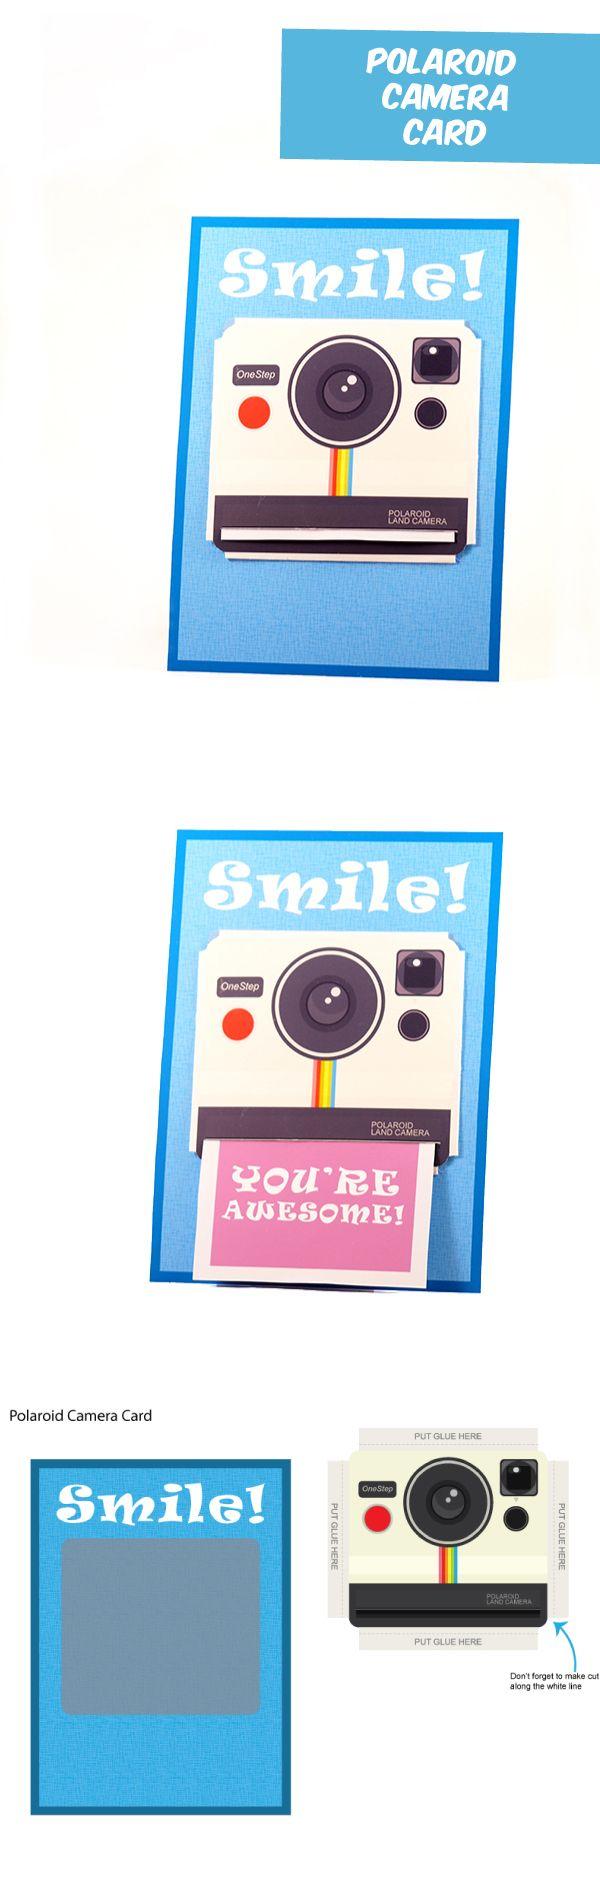 Diy papercraft polaroid camera themed gift card - Polaroid karten ...